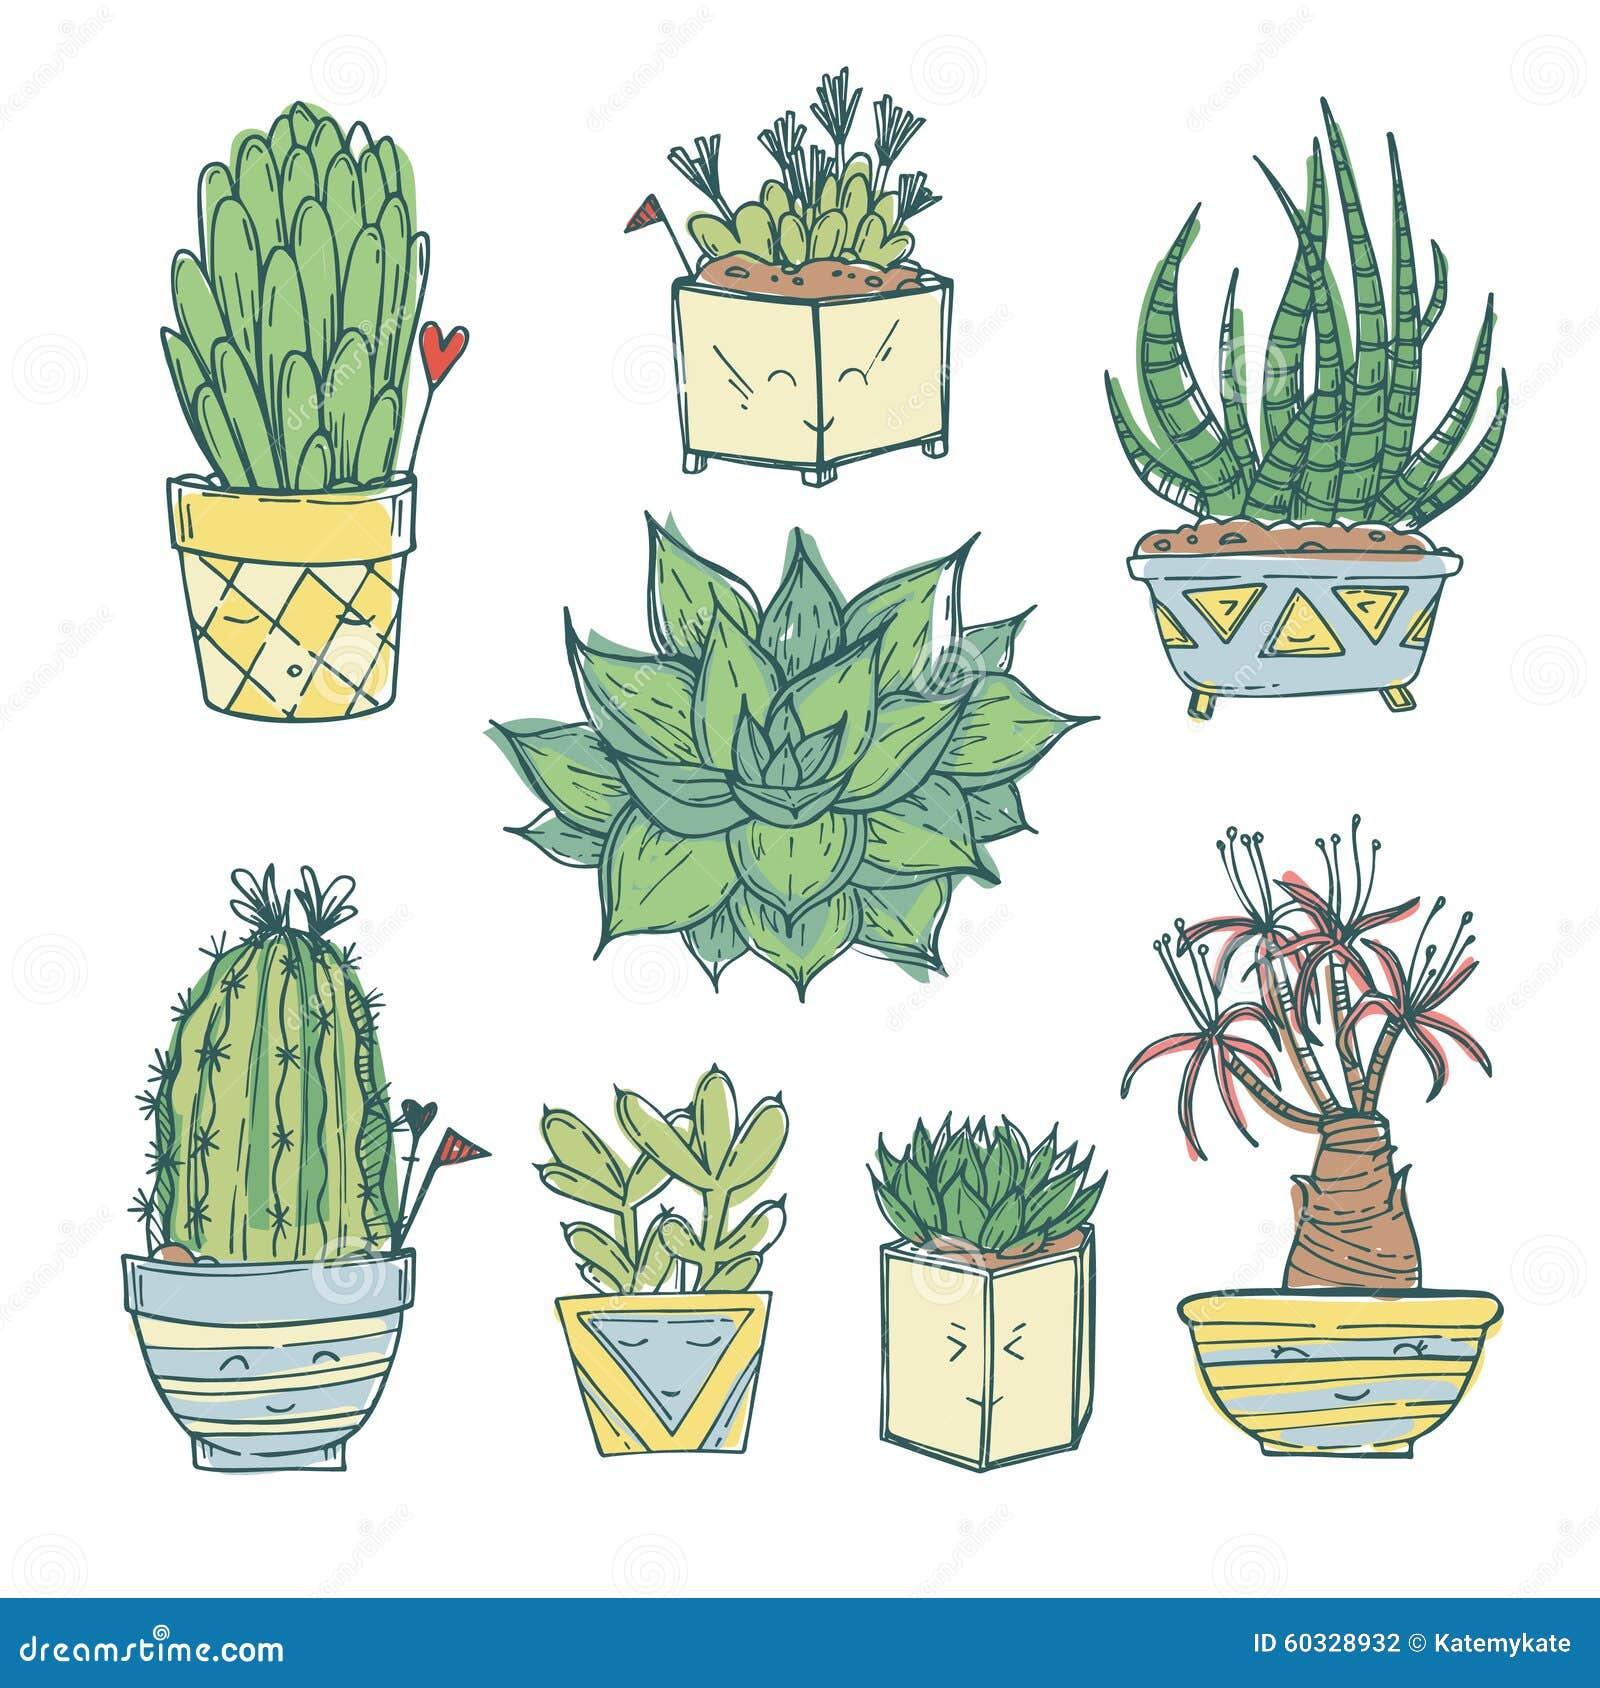 Cute Cactus Stock Illustrations 26 834 Cute Cactus Stock Illustrations Vectors Clipart Dreamstime